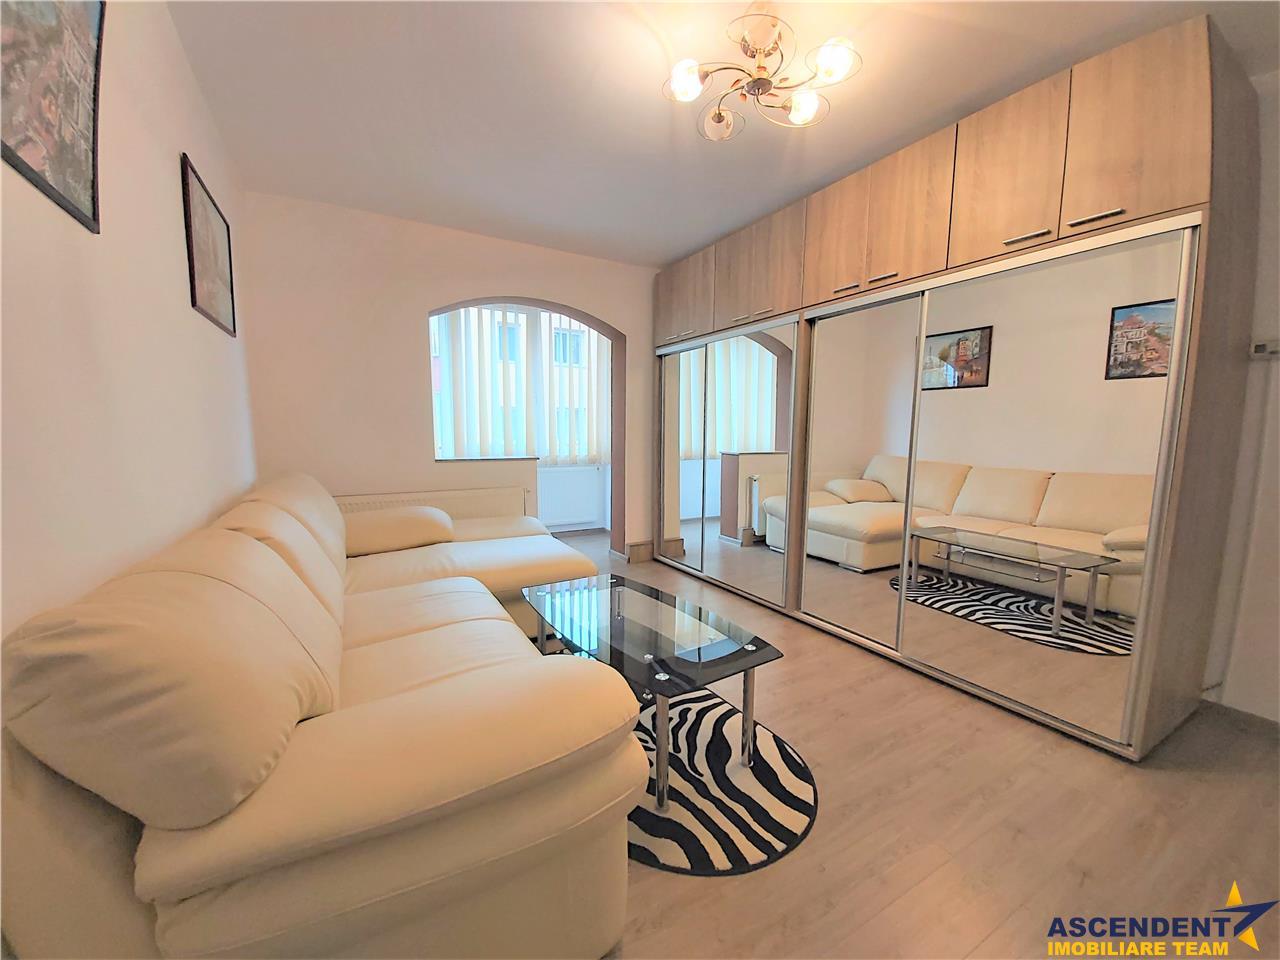 OFERTA REZERVATZA!Apartament trei camere, complet mobilat si utilat, modern, Noua, Brasov